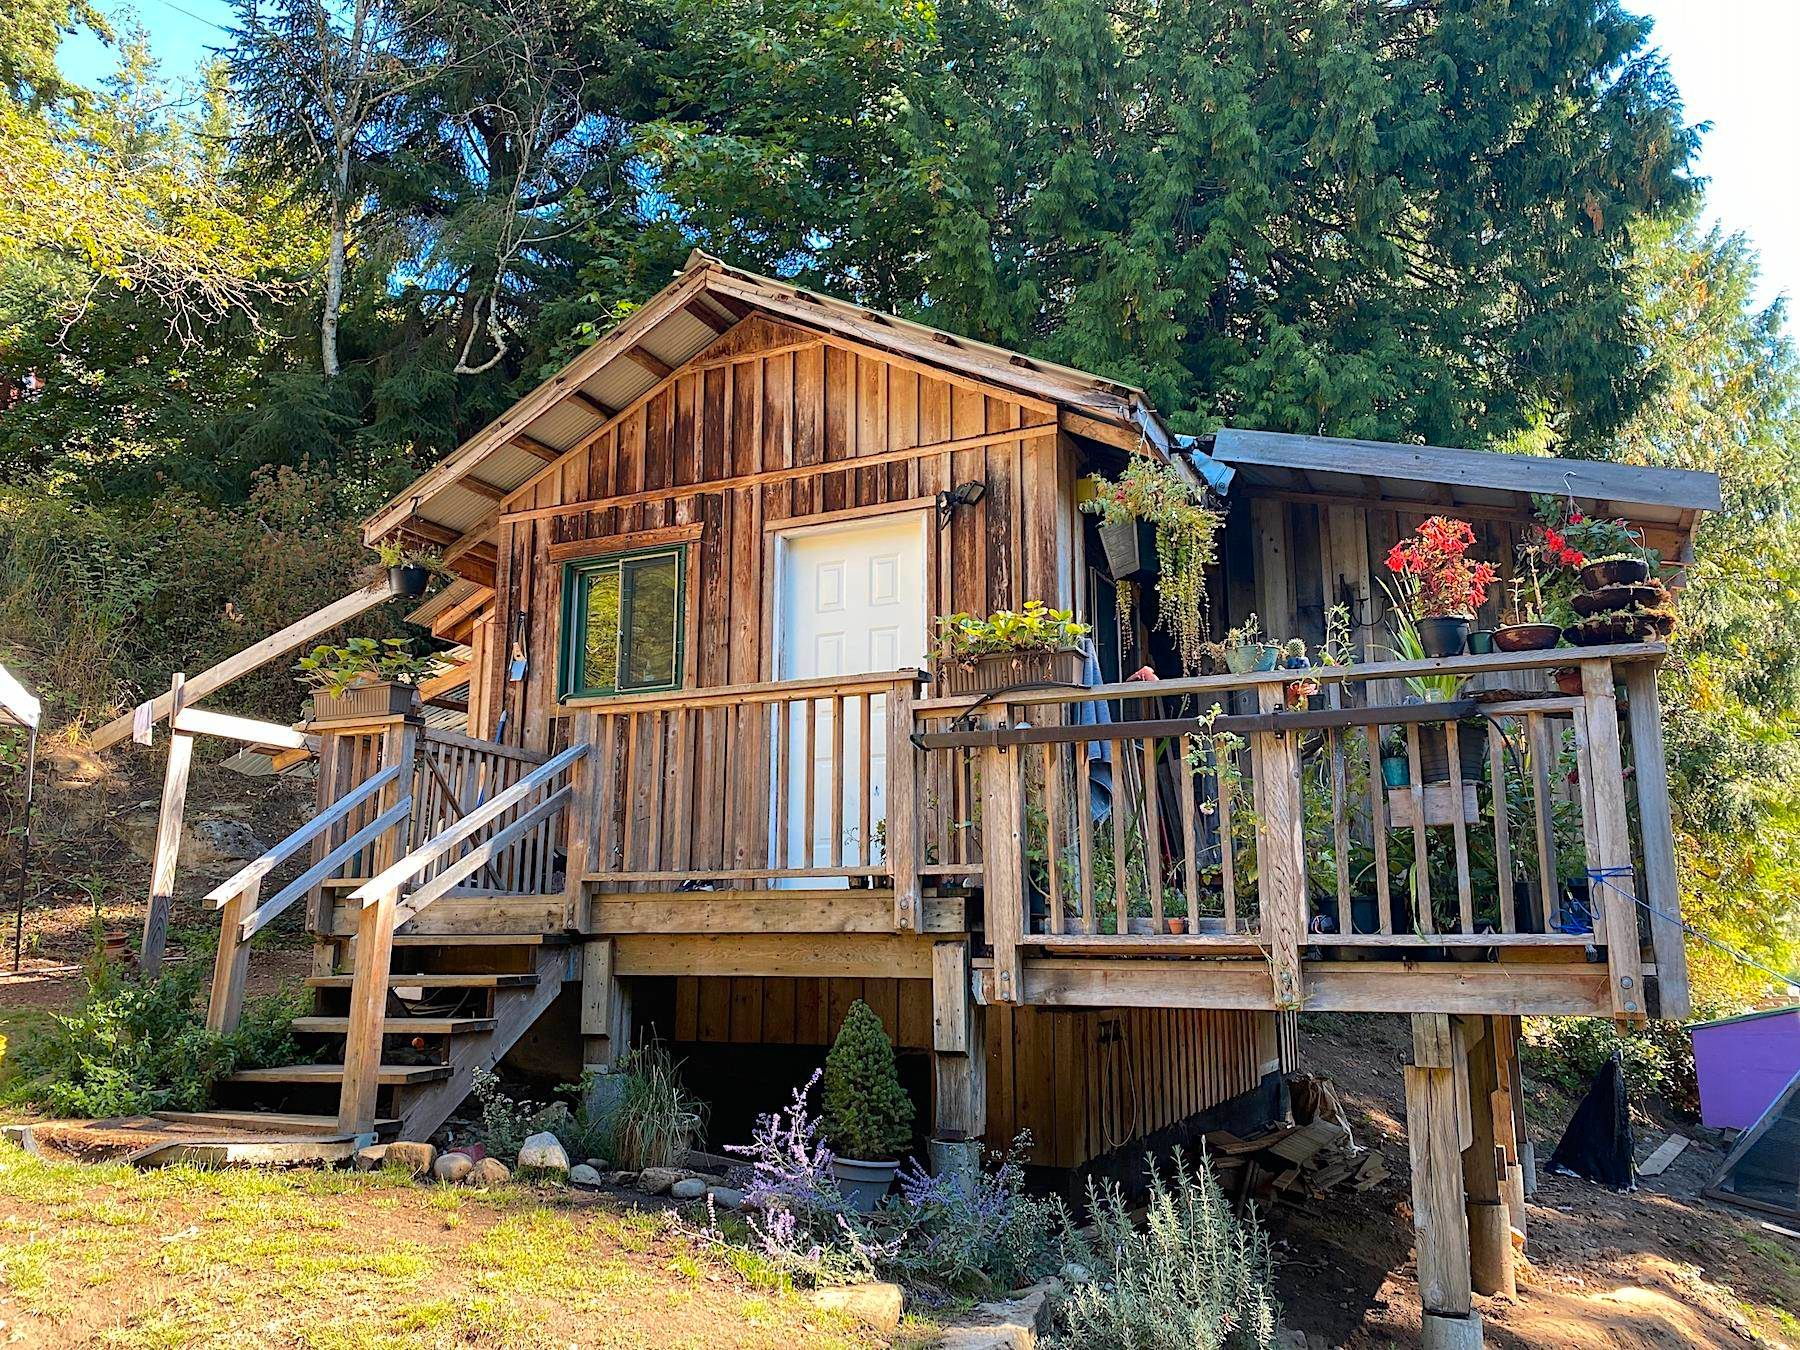 Main Photo: 840 COTTAGE Way: Galiano Island House for sale (Islands-Van. & Gulf)  : MLS®# R2618295